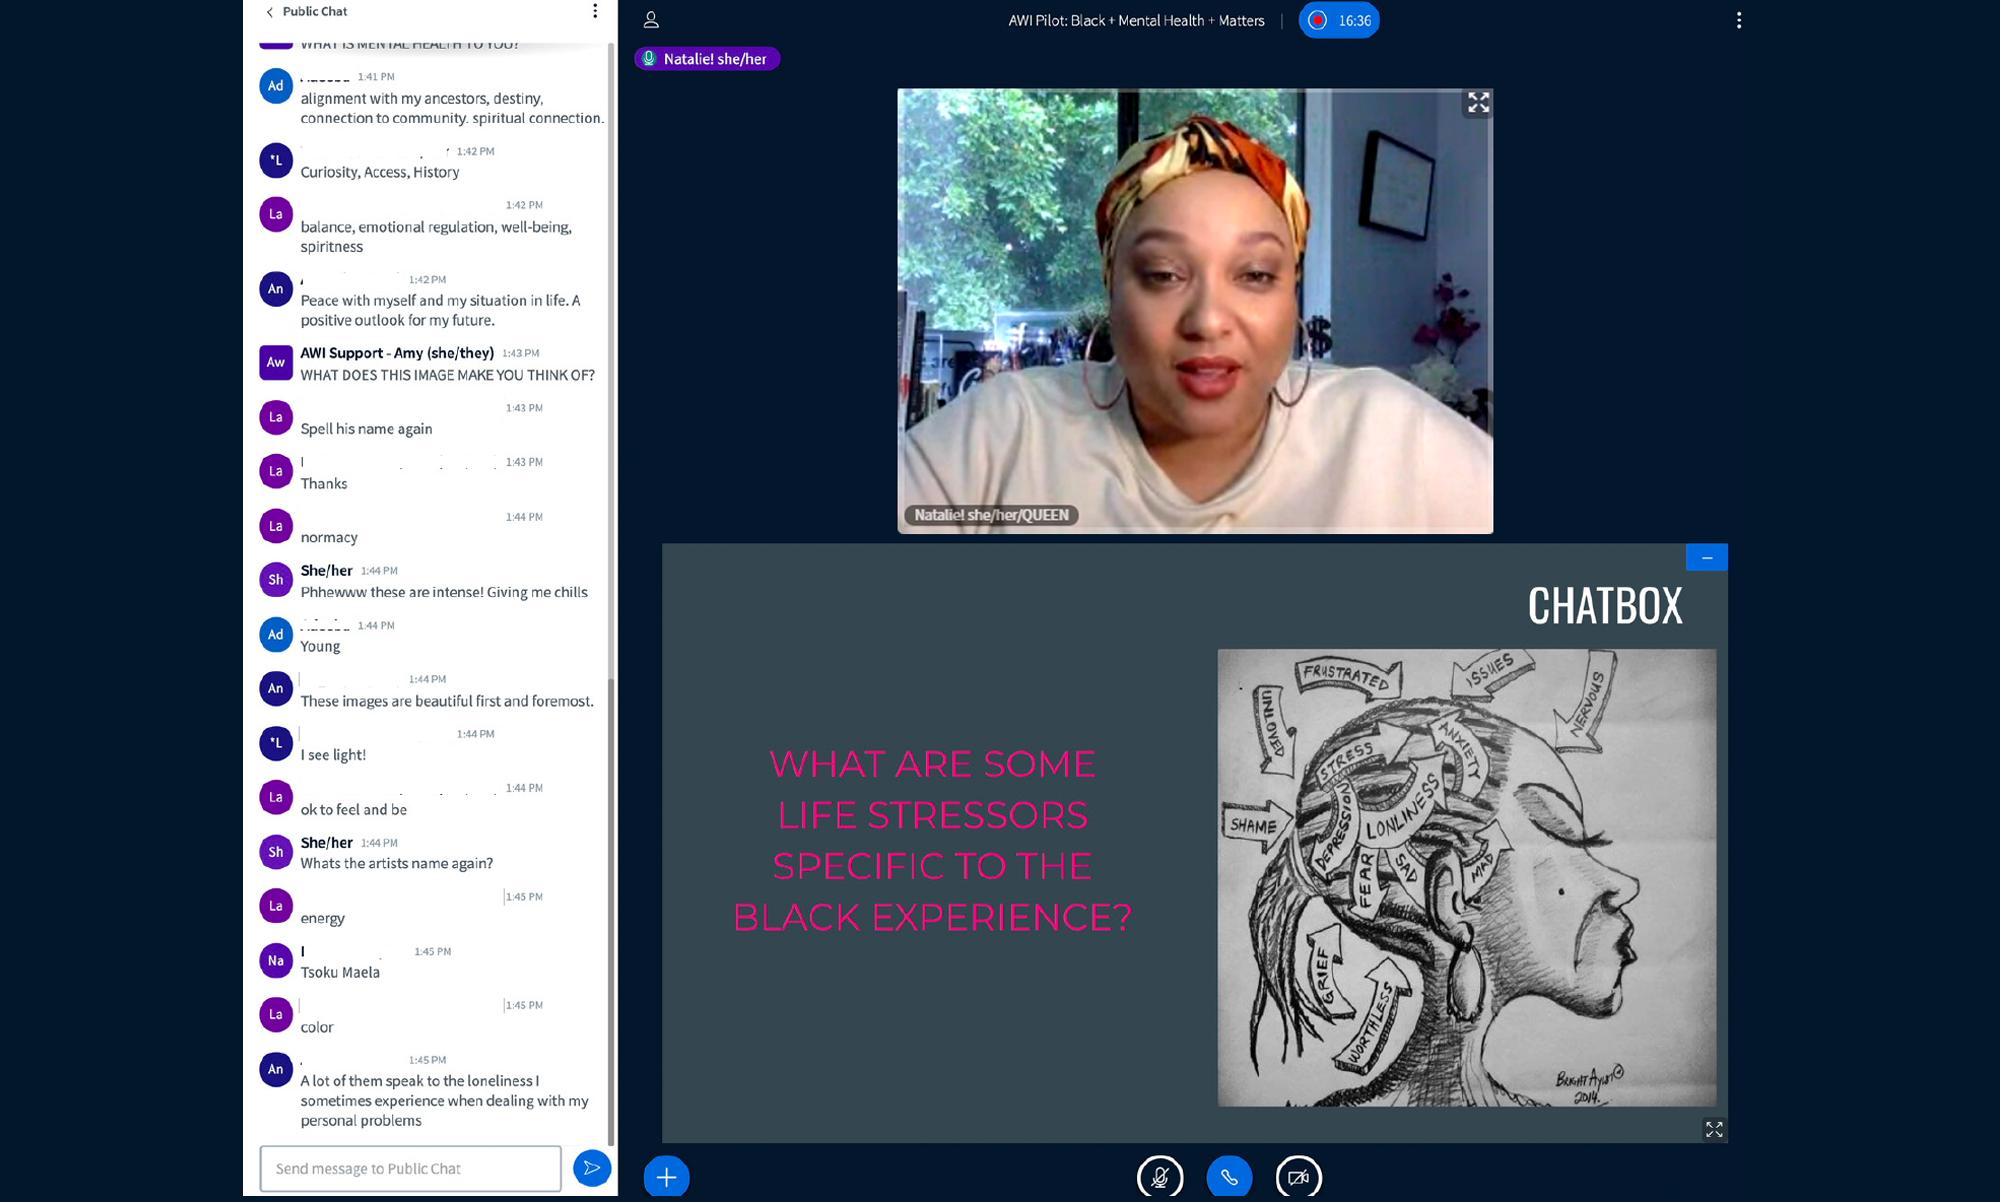 Black + Mental Health + Matters